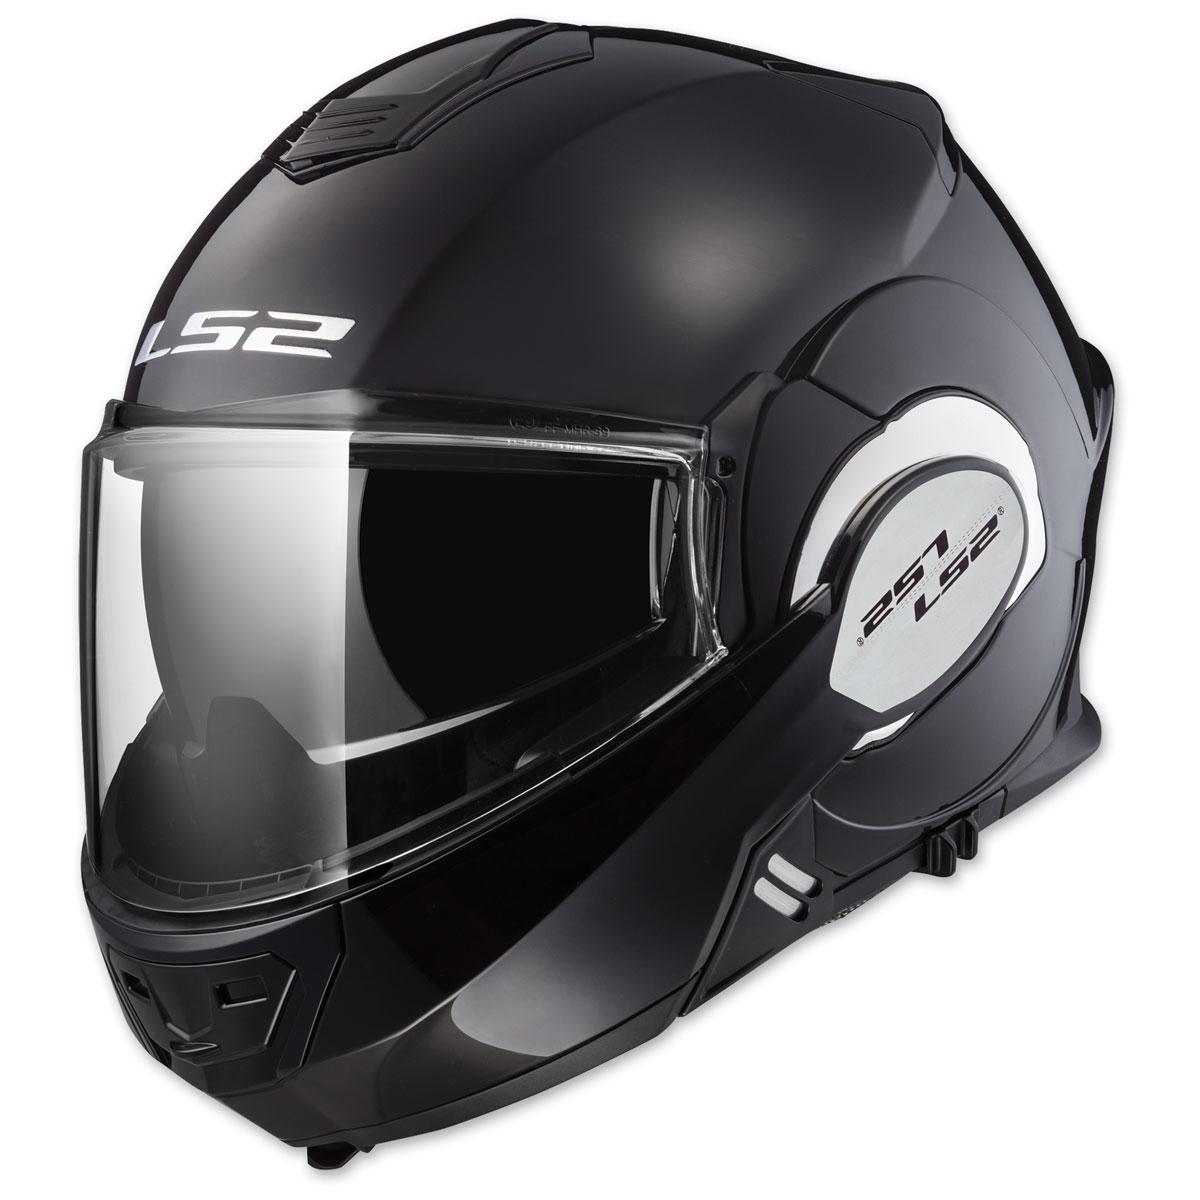 LS2 Valiant Gloss Black Modular Helmet